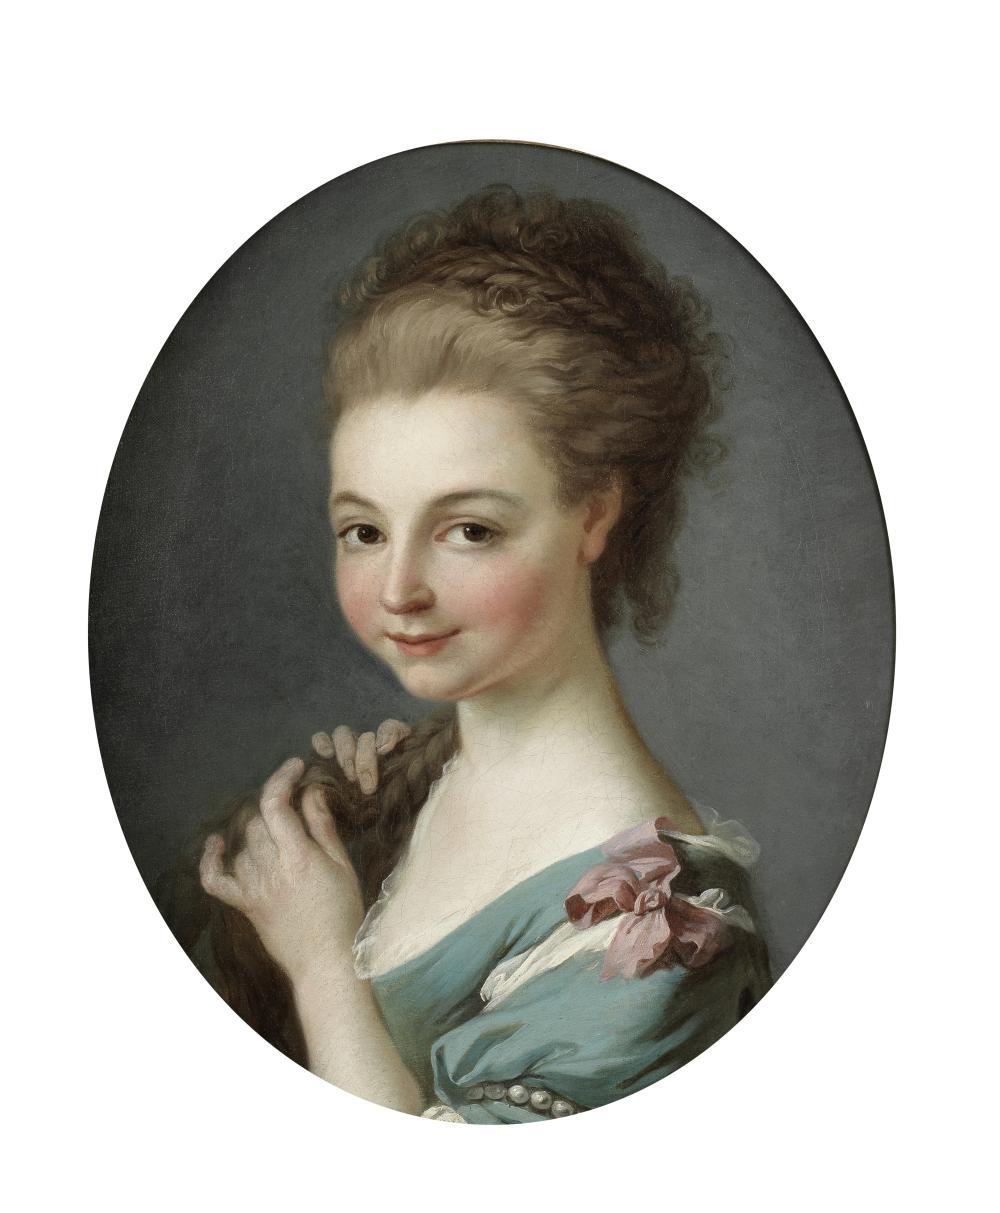 Alexander Roslin (Malmo 1718-1793 Paris) Portrait of a young girl